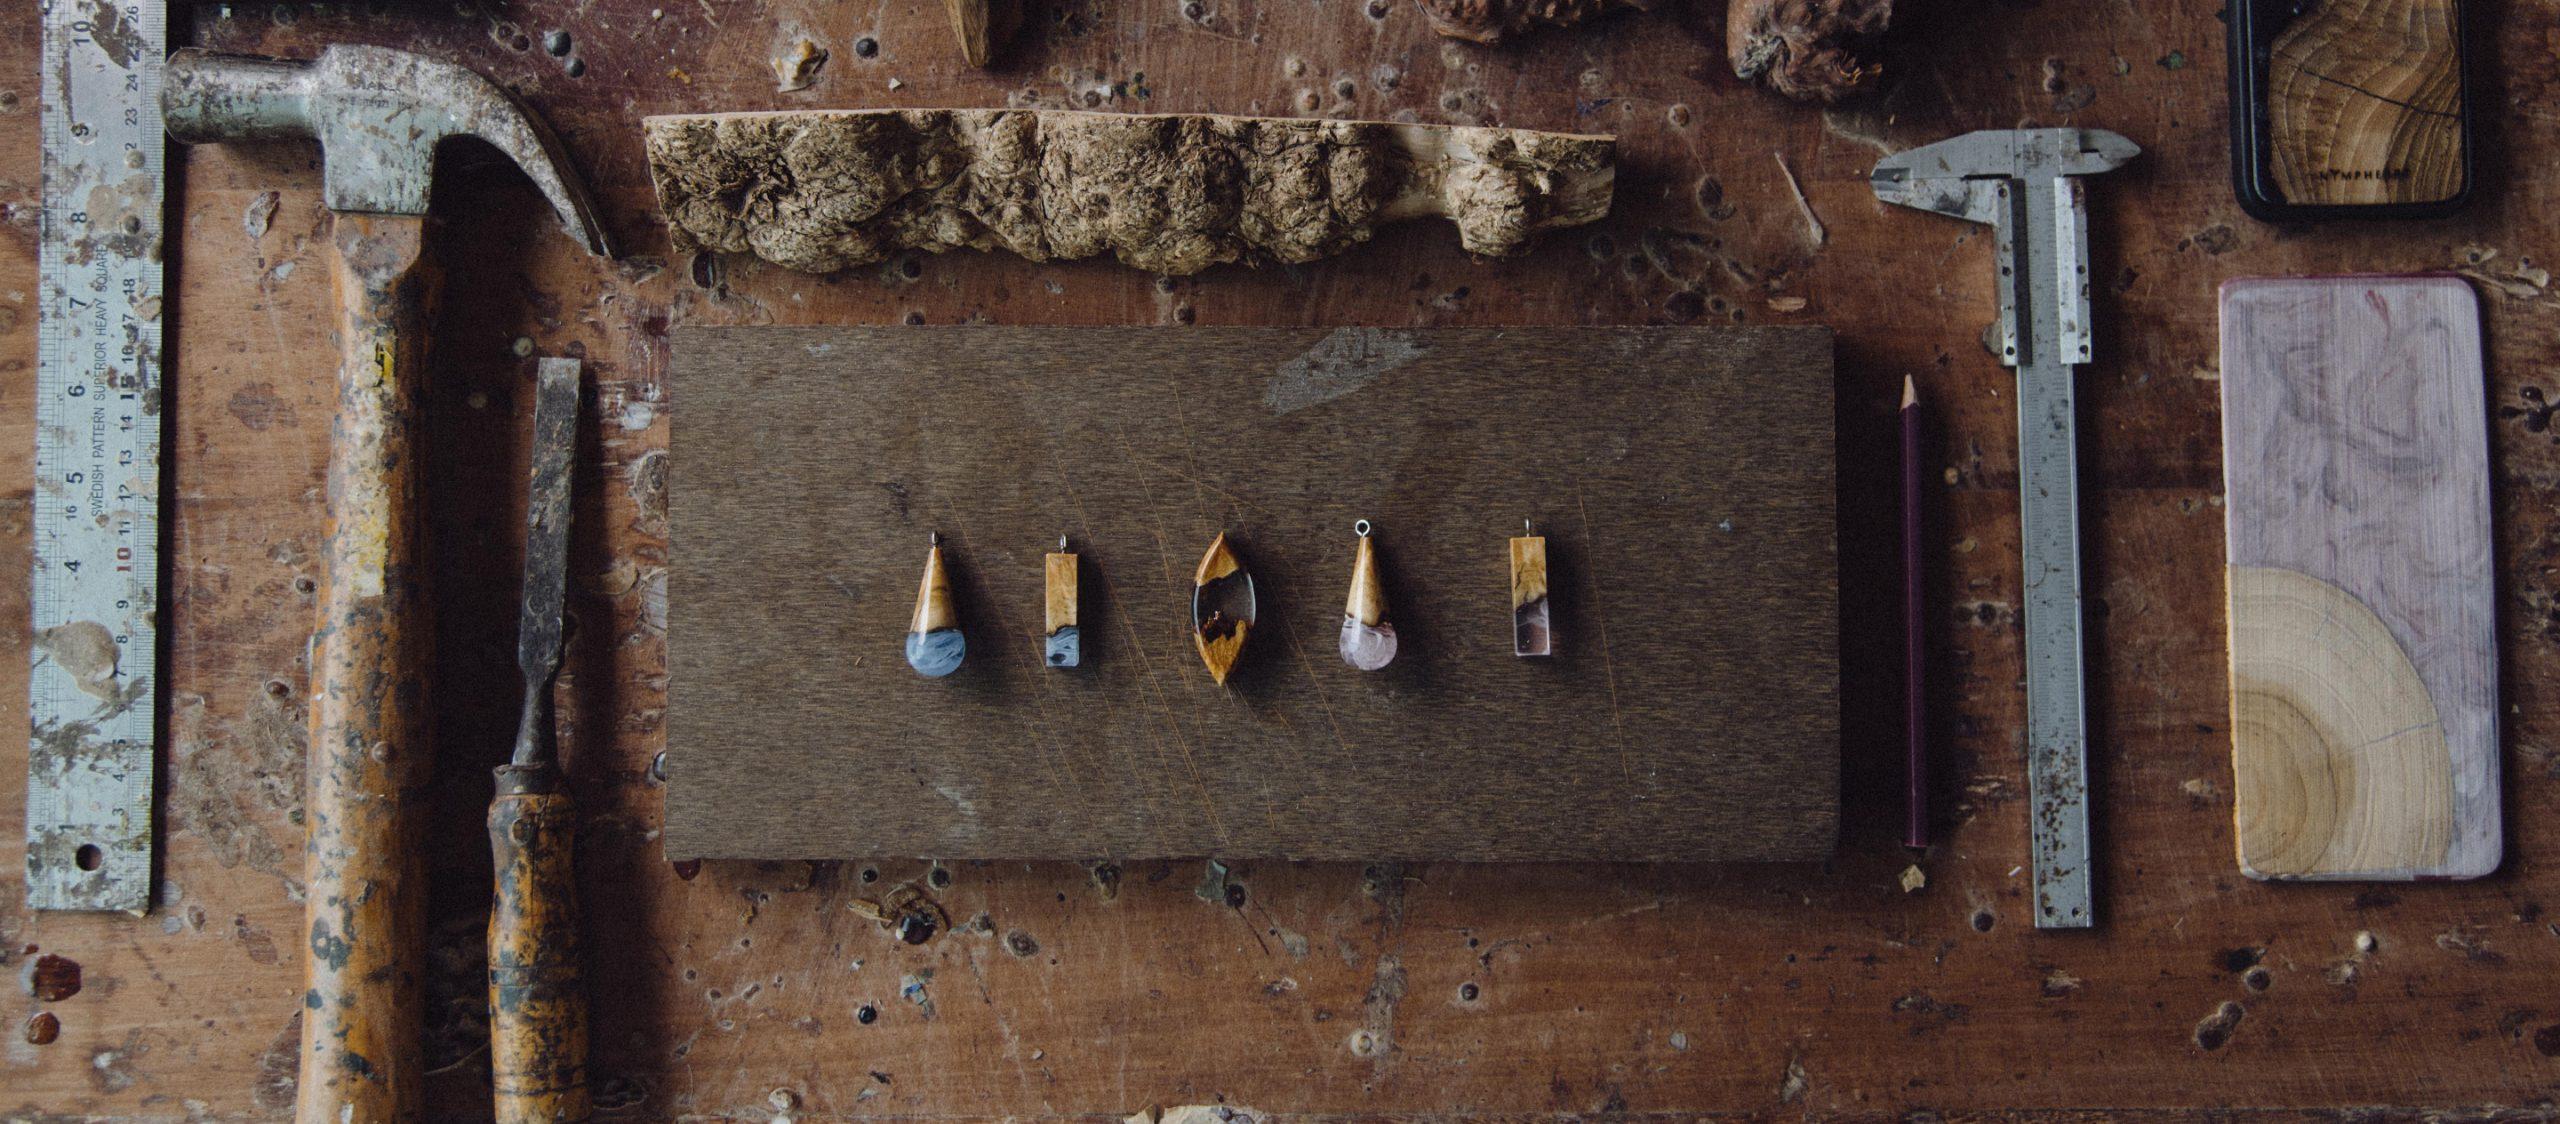 Nympheart แบรนด์จิวเวลรีที่เปลี่ยนเศษไม้เหลือใช้เป็นเครื่องประดับที่มีชิ้นเดียวในโลก